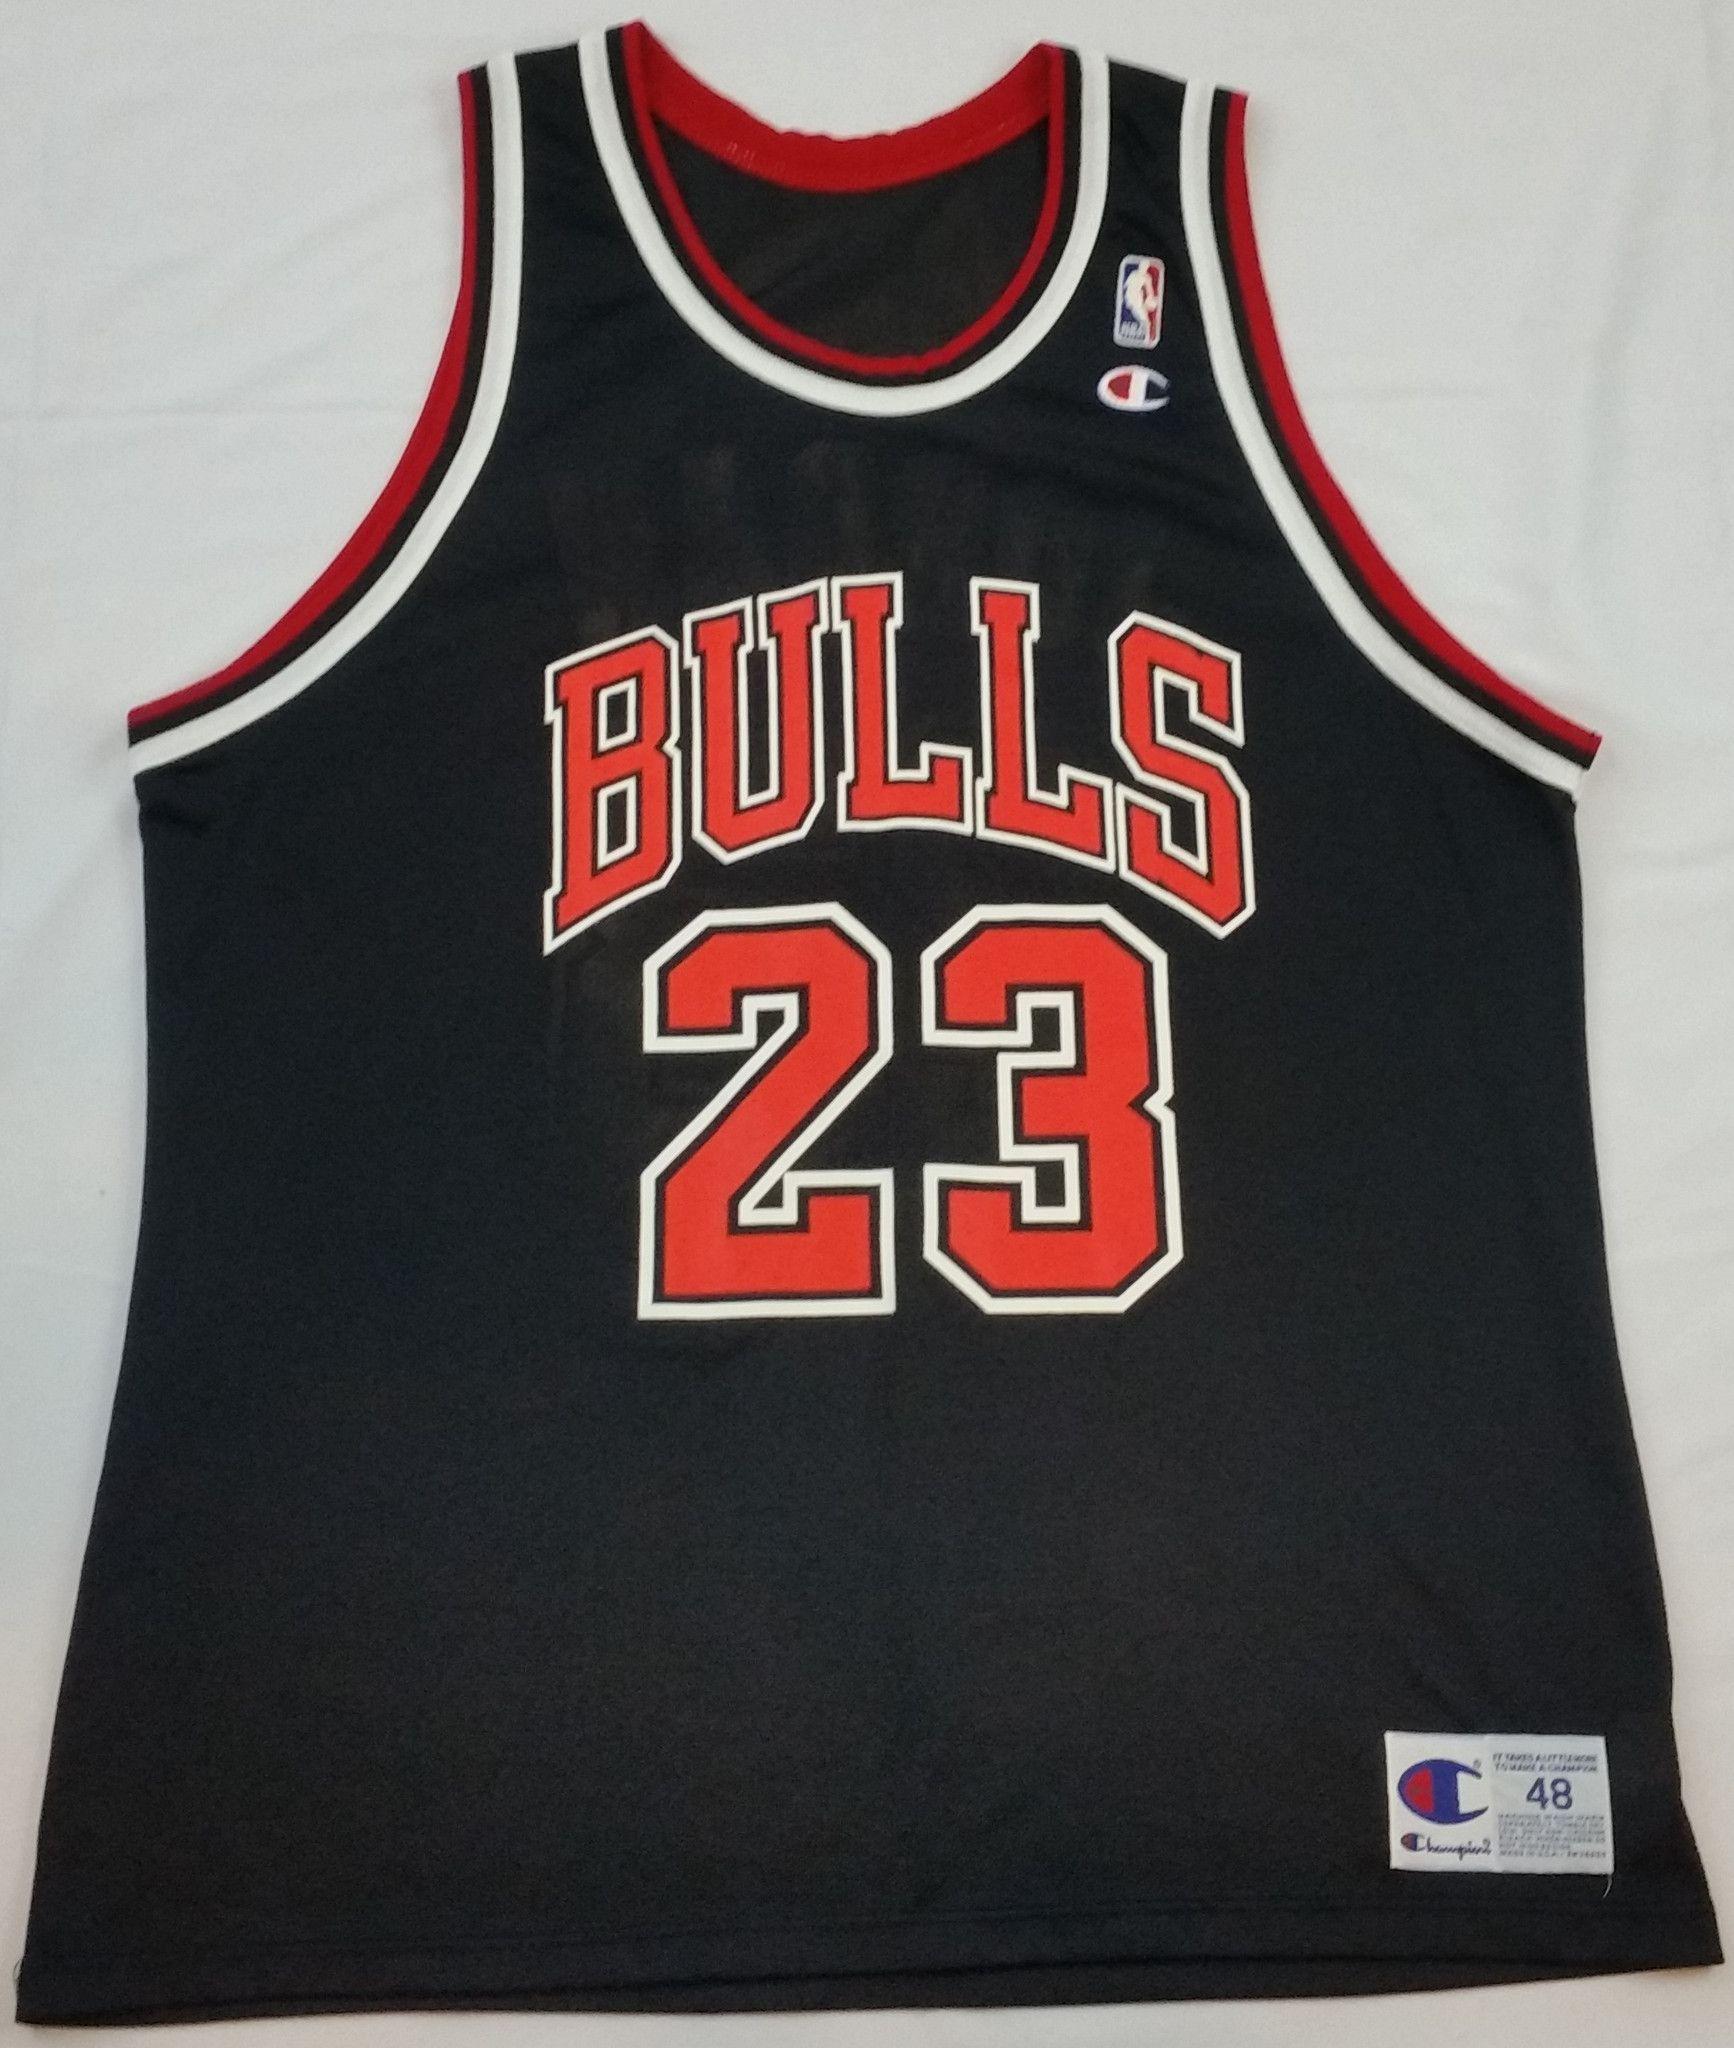 9ab272872f4 Michael Jordan  23 Chicago Bulls Champion Jersey NBA Vintage Black Rare  Mens 48